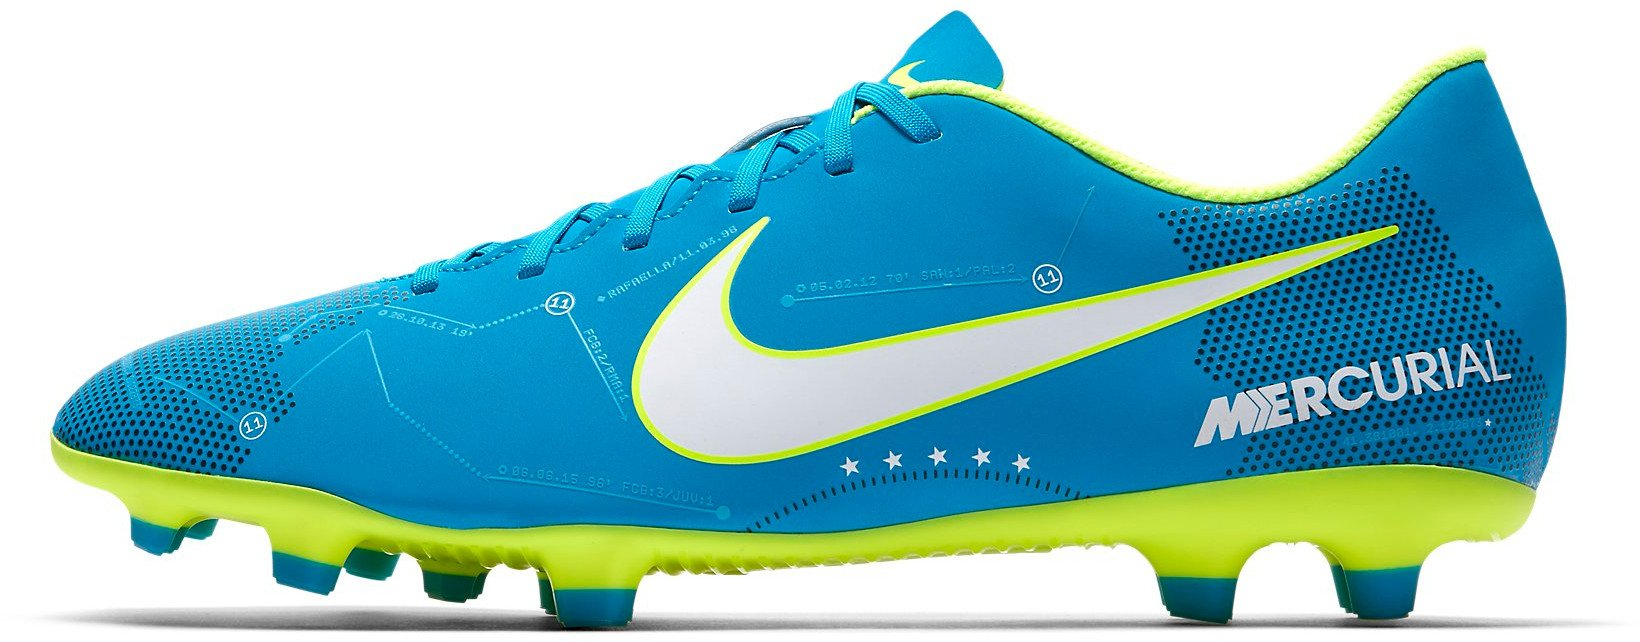 Football shoes Nike MERCURIAL VORTEX